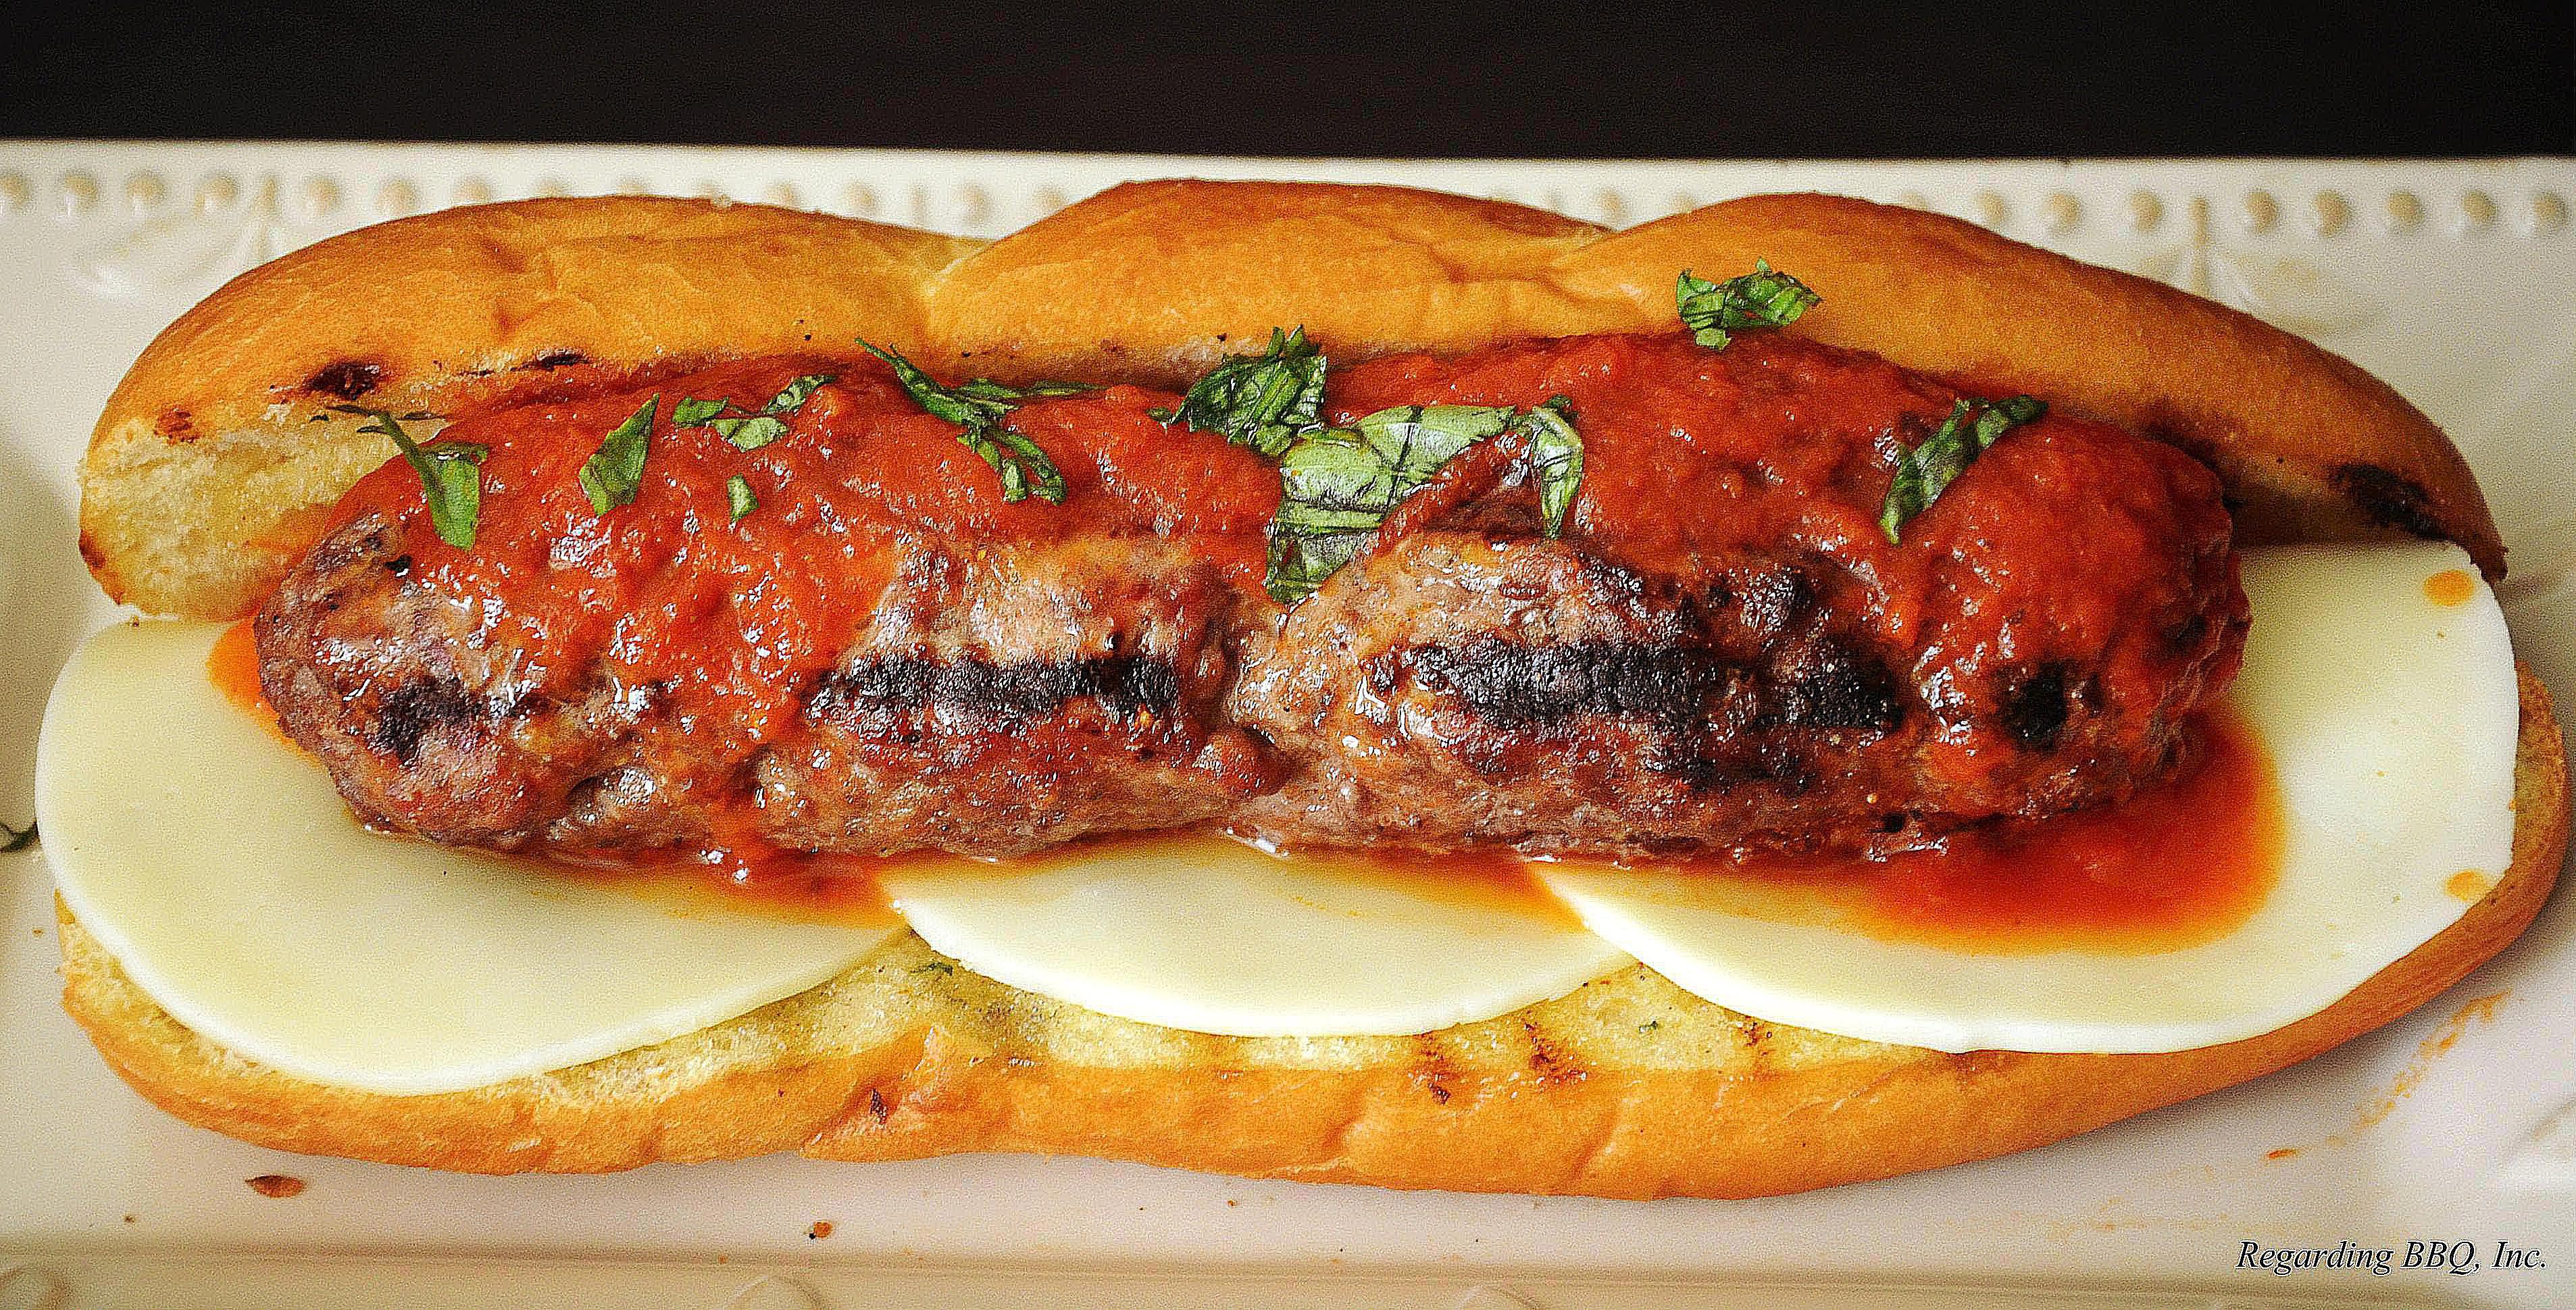 The Ultimate Meatball Sandwich